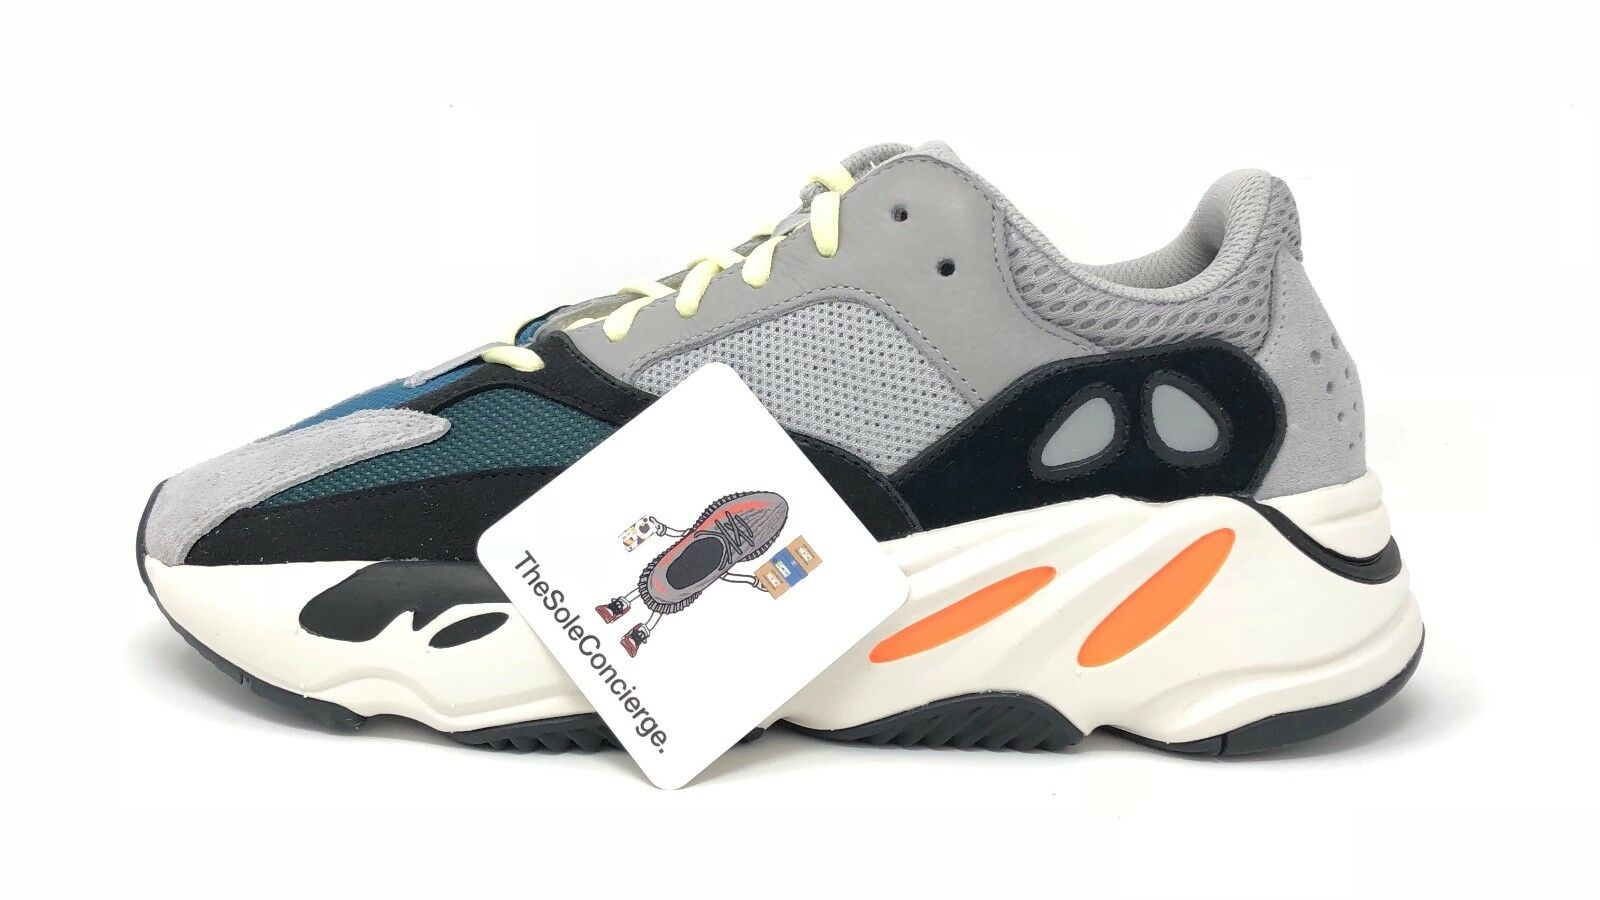 ADIDAS Originals Yeezy B75571. Boost 700 WaveRunner B75571. Yeezy UK7.5/US8. 100% Autentico! 79f81f